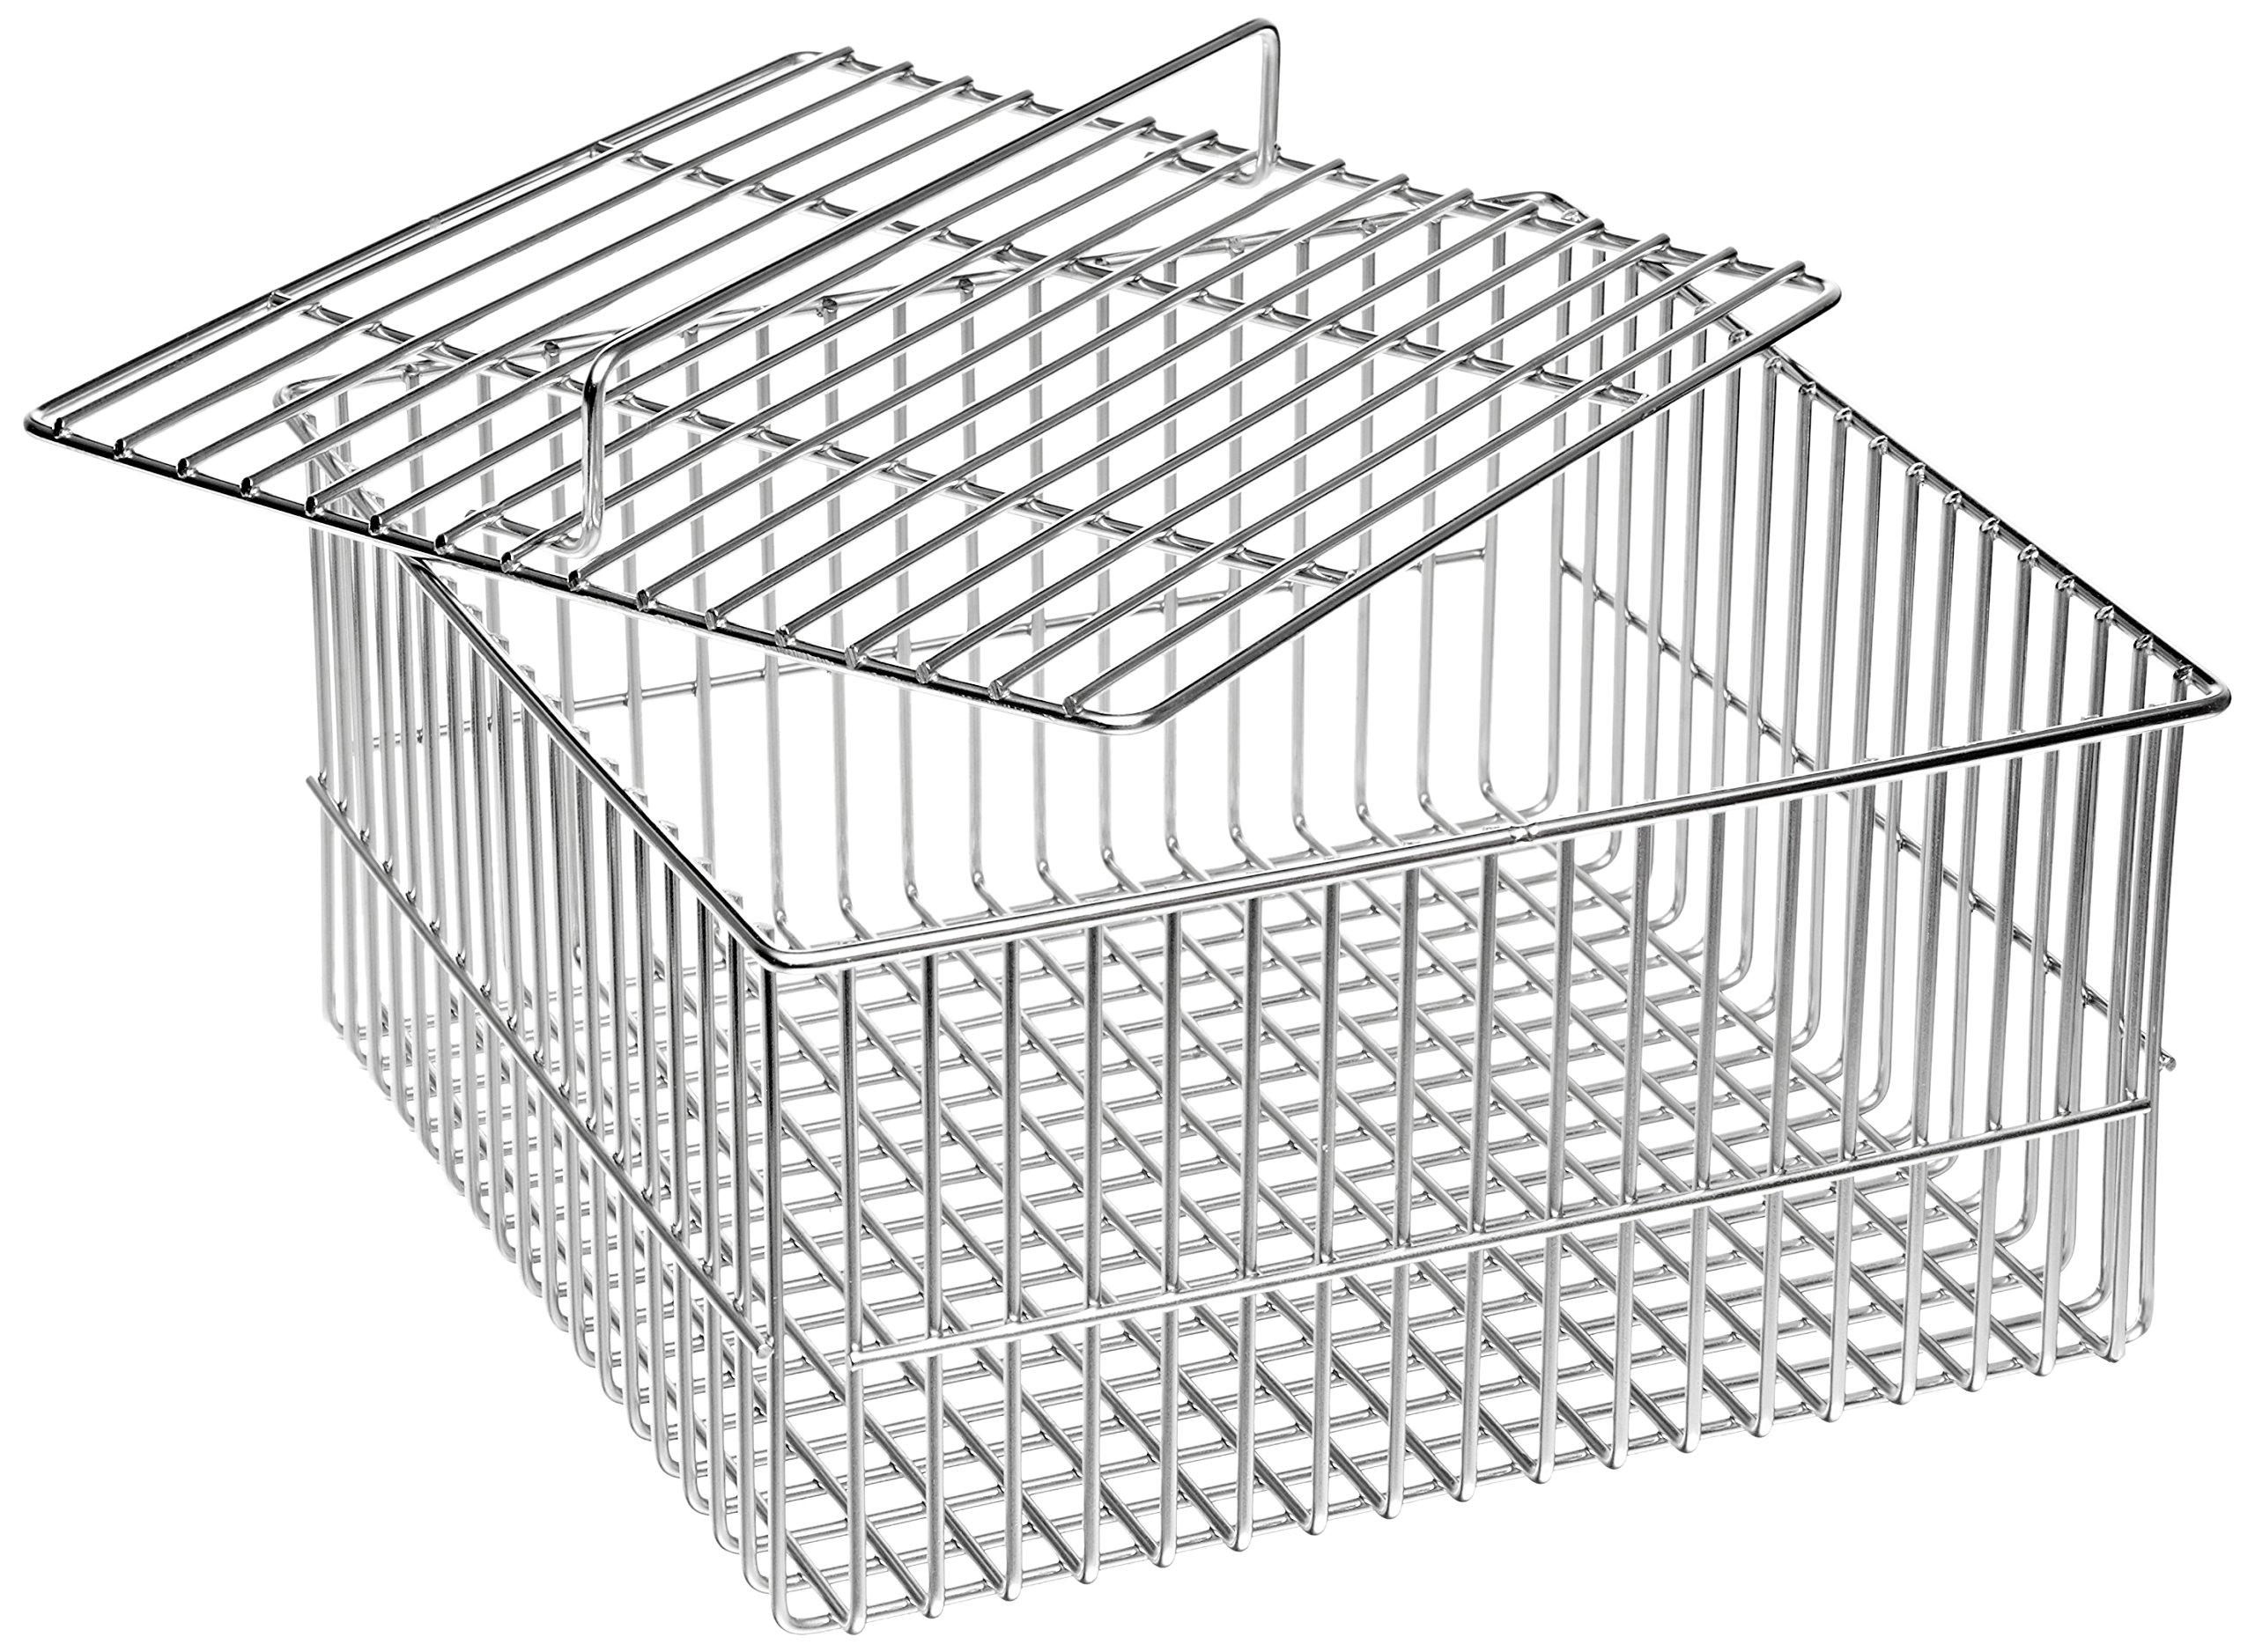 Labconco 4402201 Stainless Steel Utensil Basket Insert, 8'' Width by Labconco